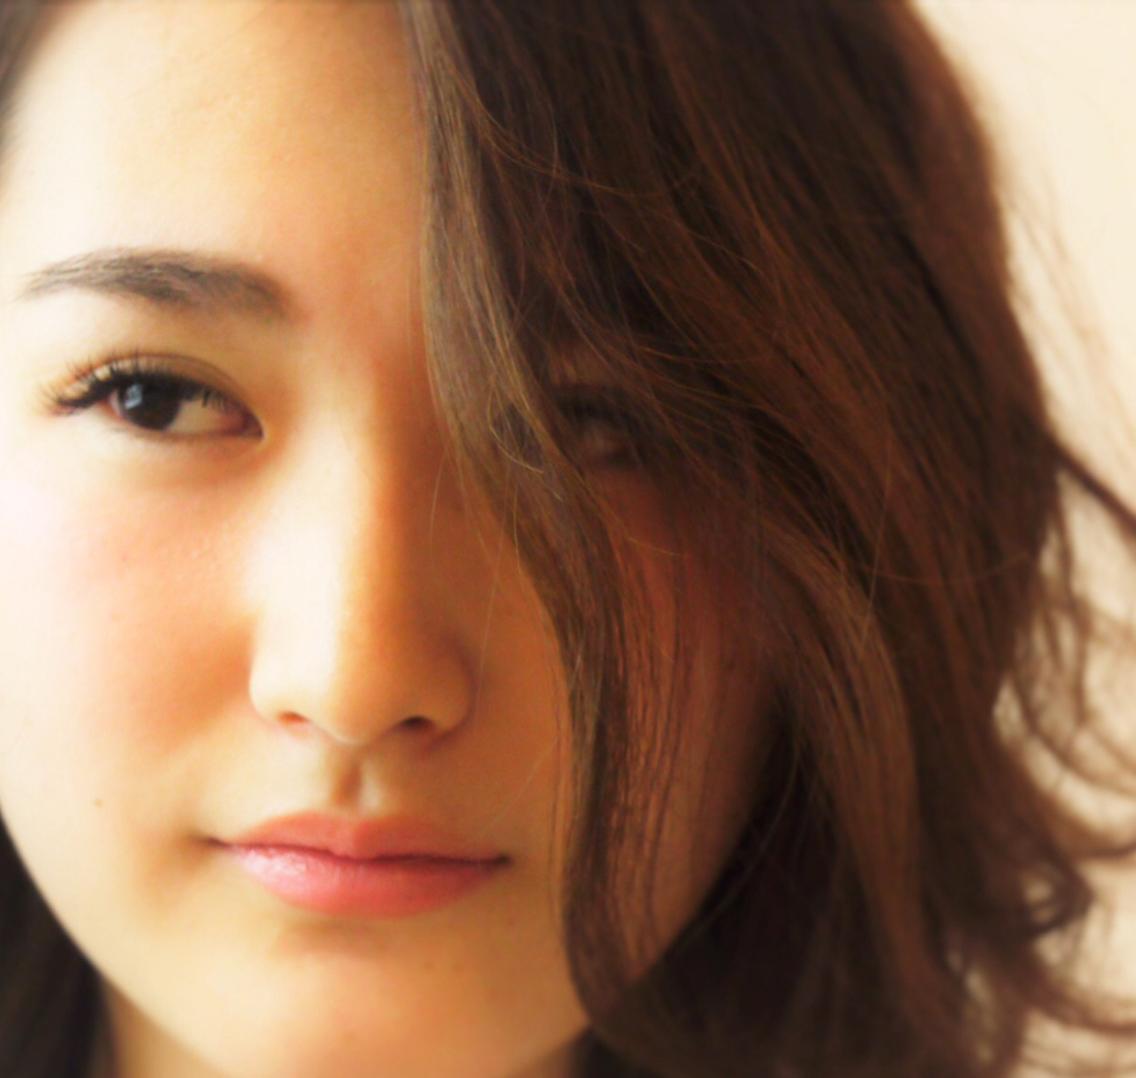 Triche hair&eye所属・tsubotakanaの掲載